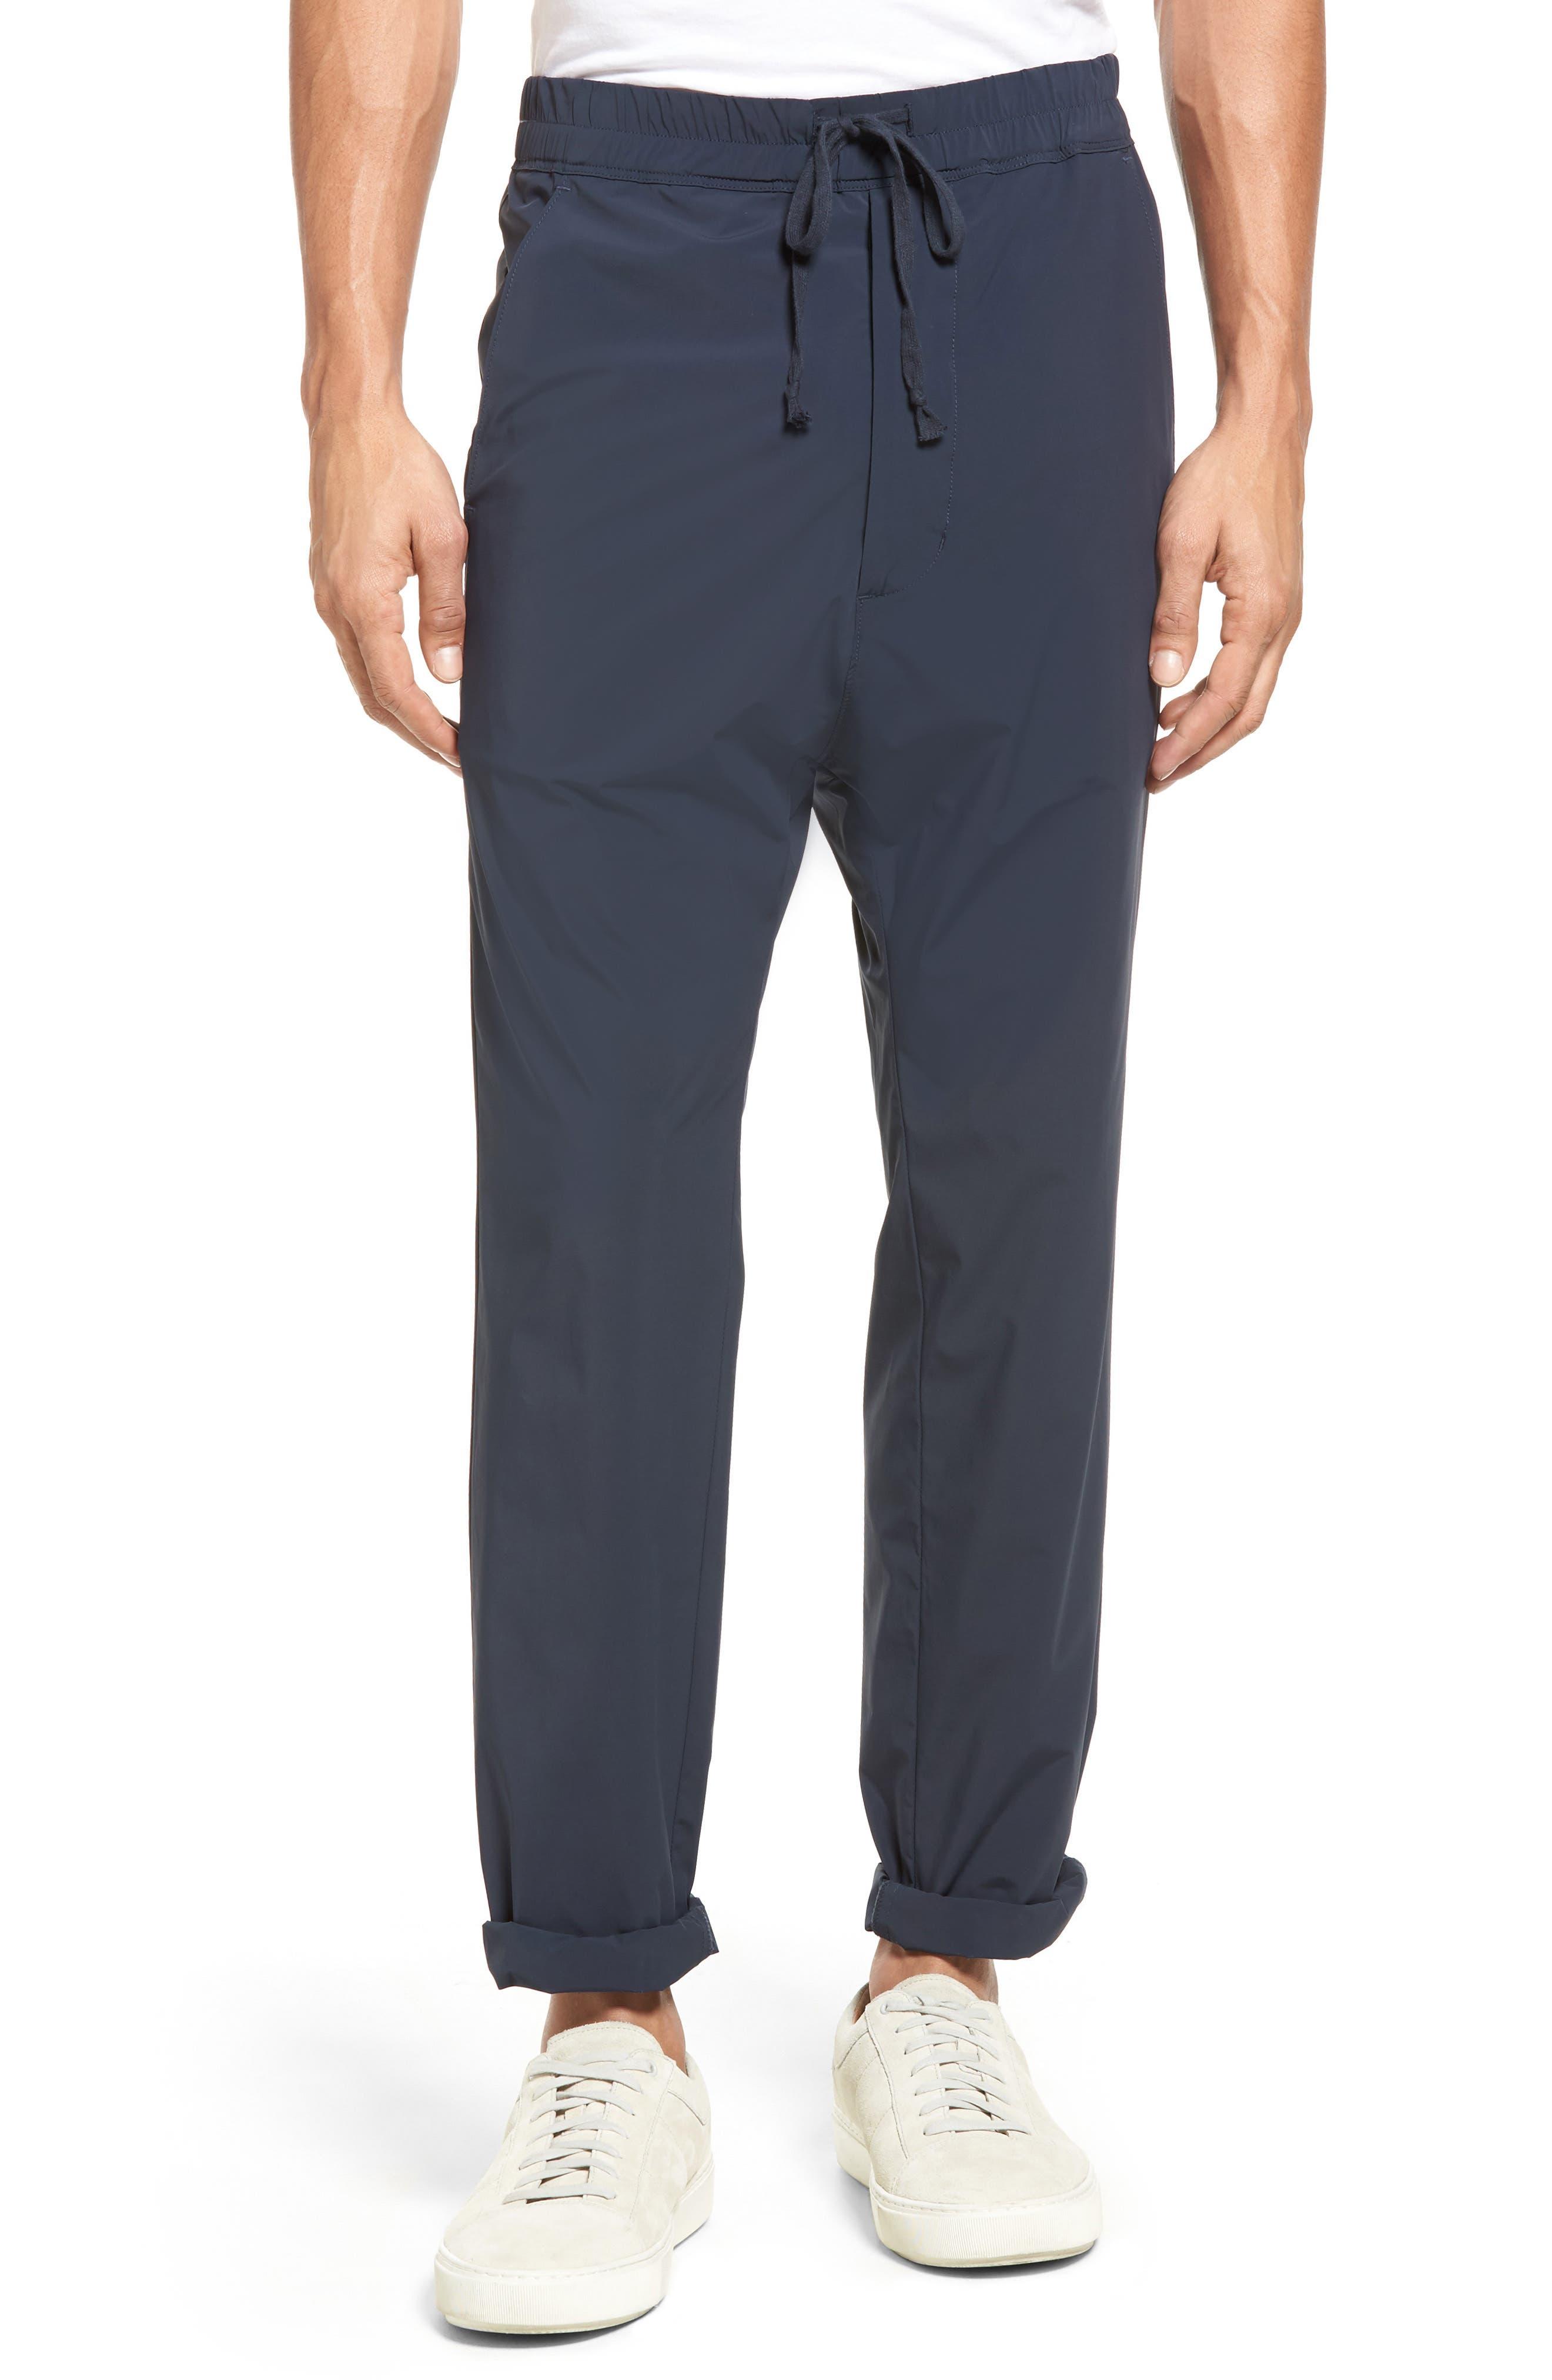 Alternate Image 1 Selected - Vince Drop Crotch Jogger Pants